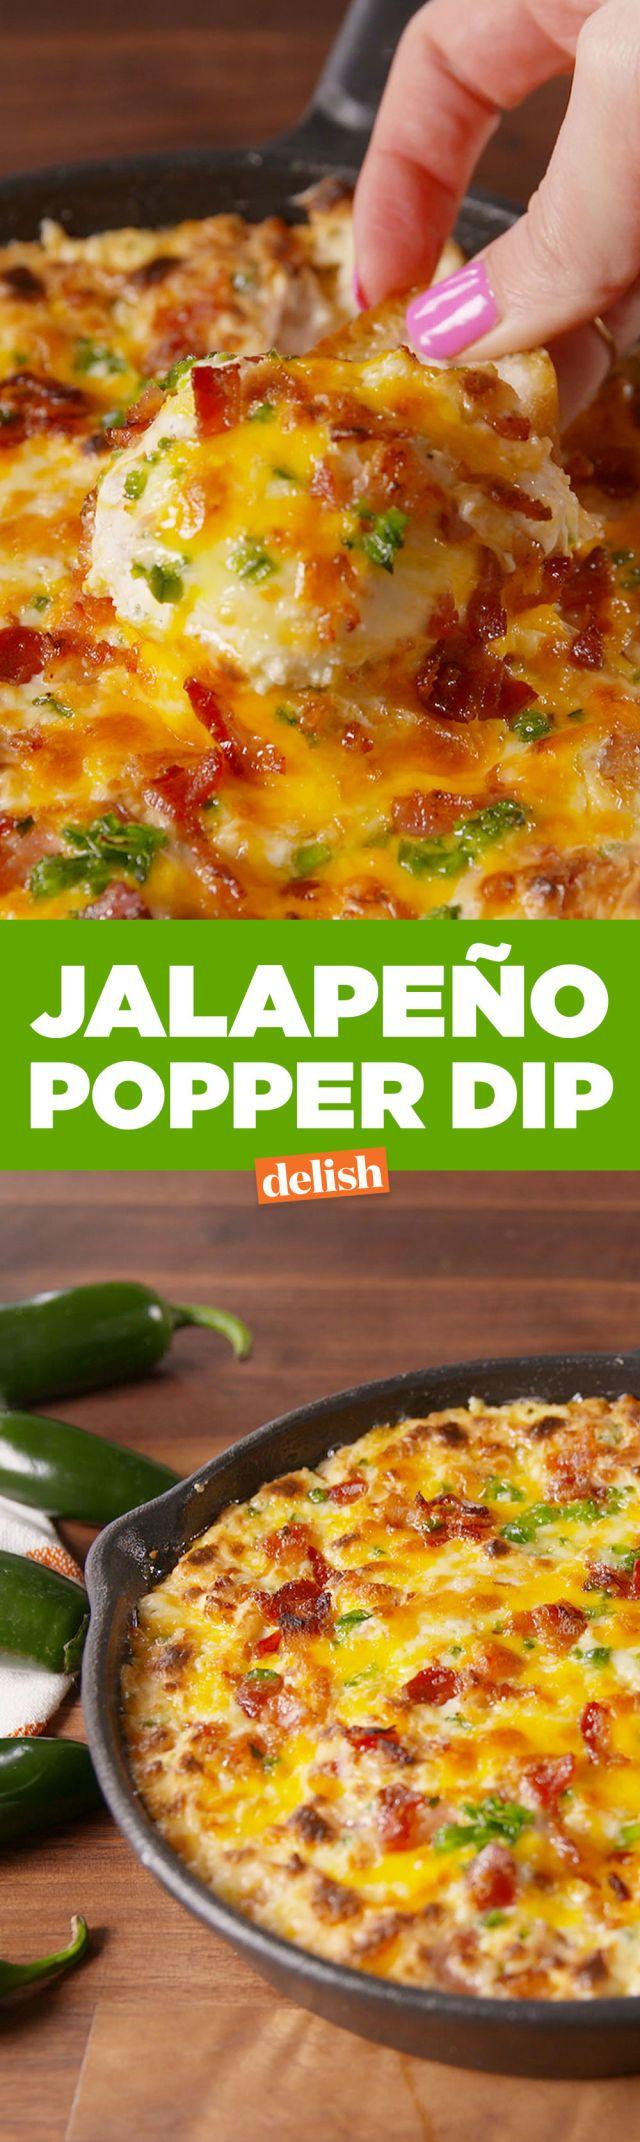 This dip's got a kick!